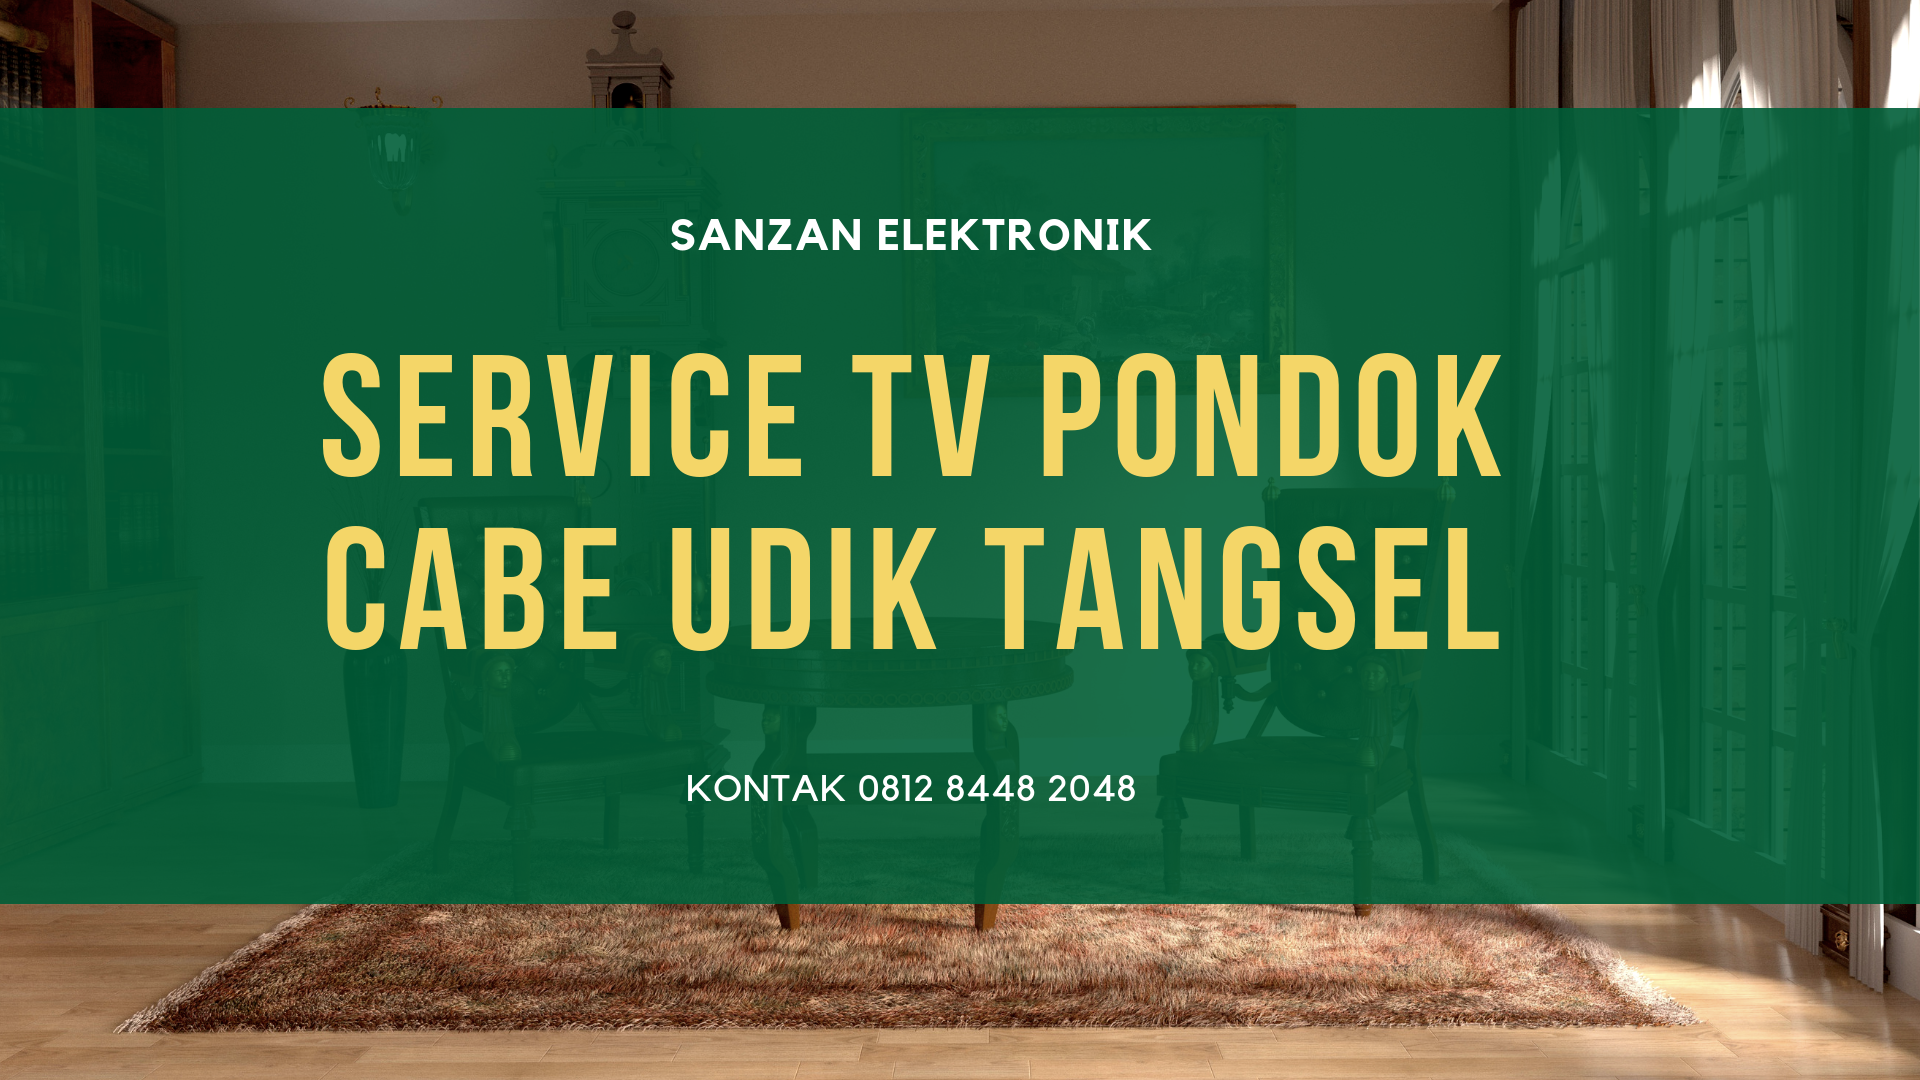 Service TV Pondok Cabe Udik Tangsel